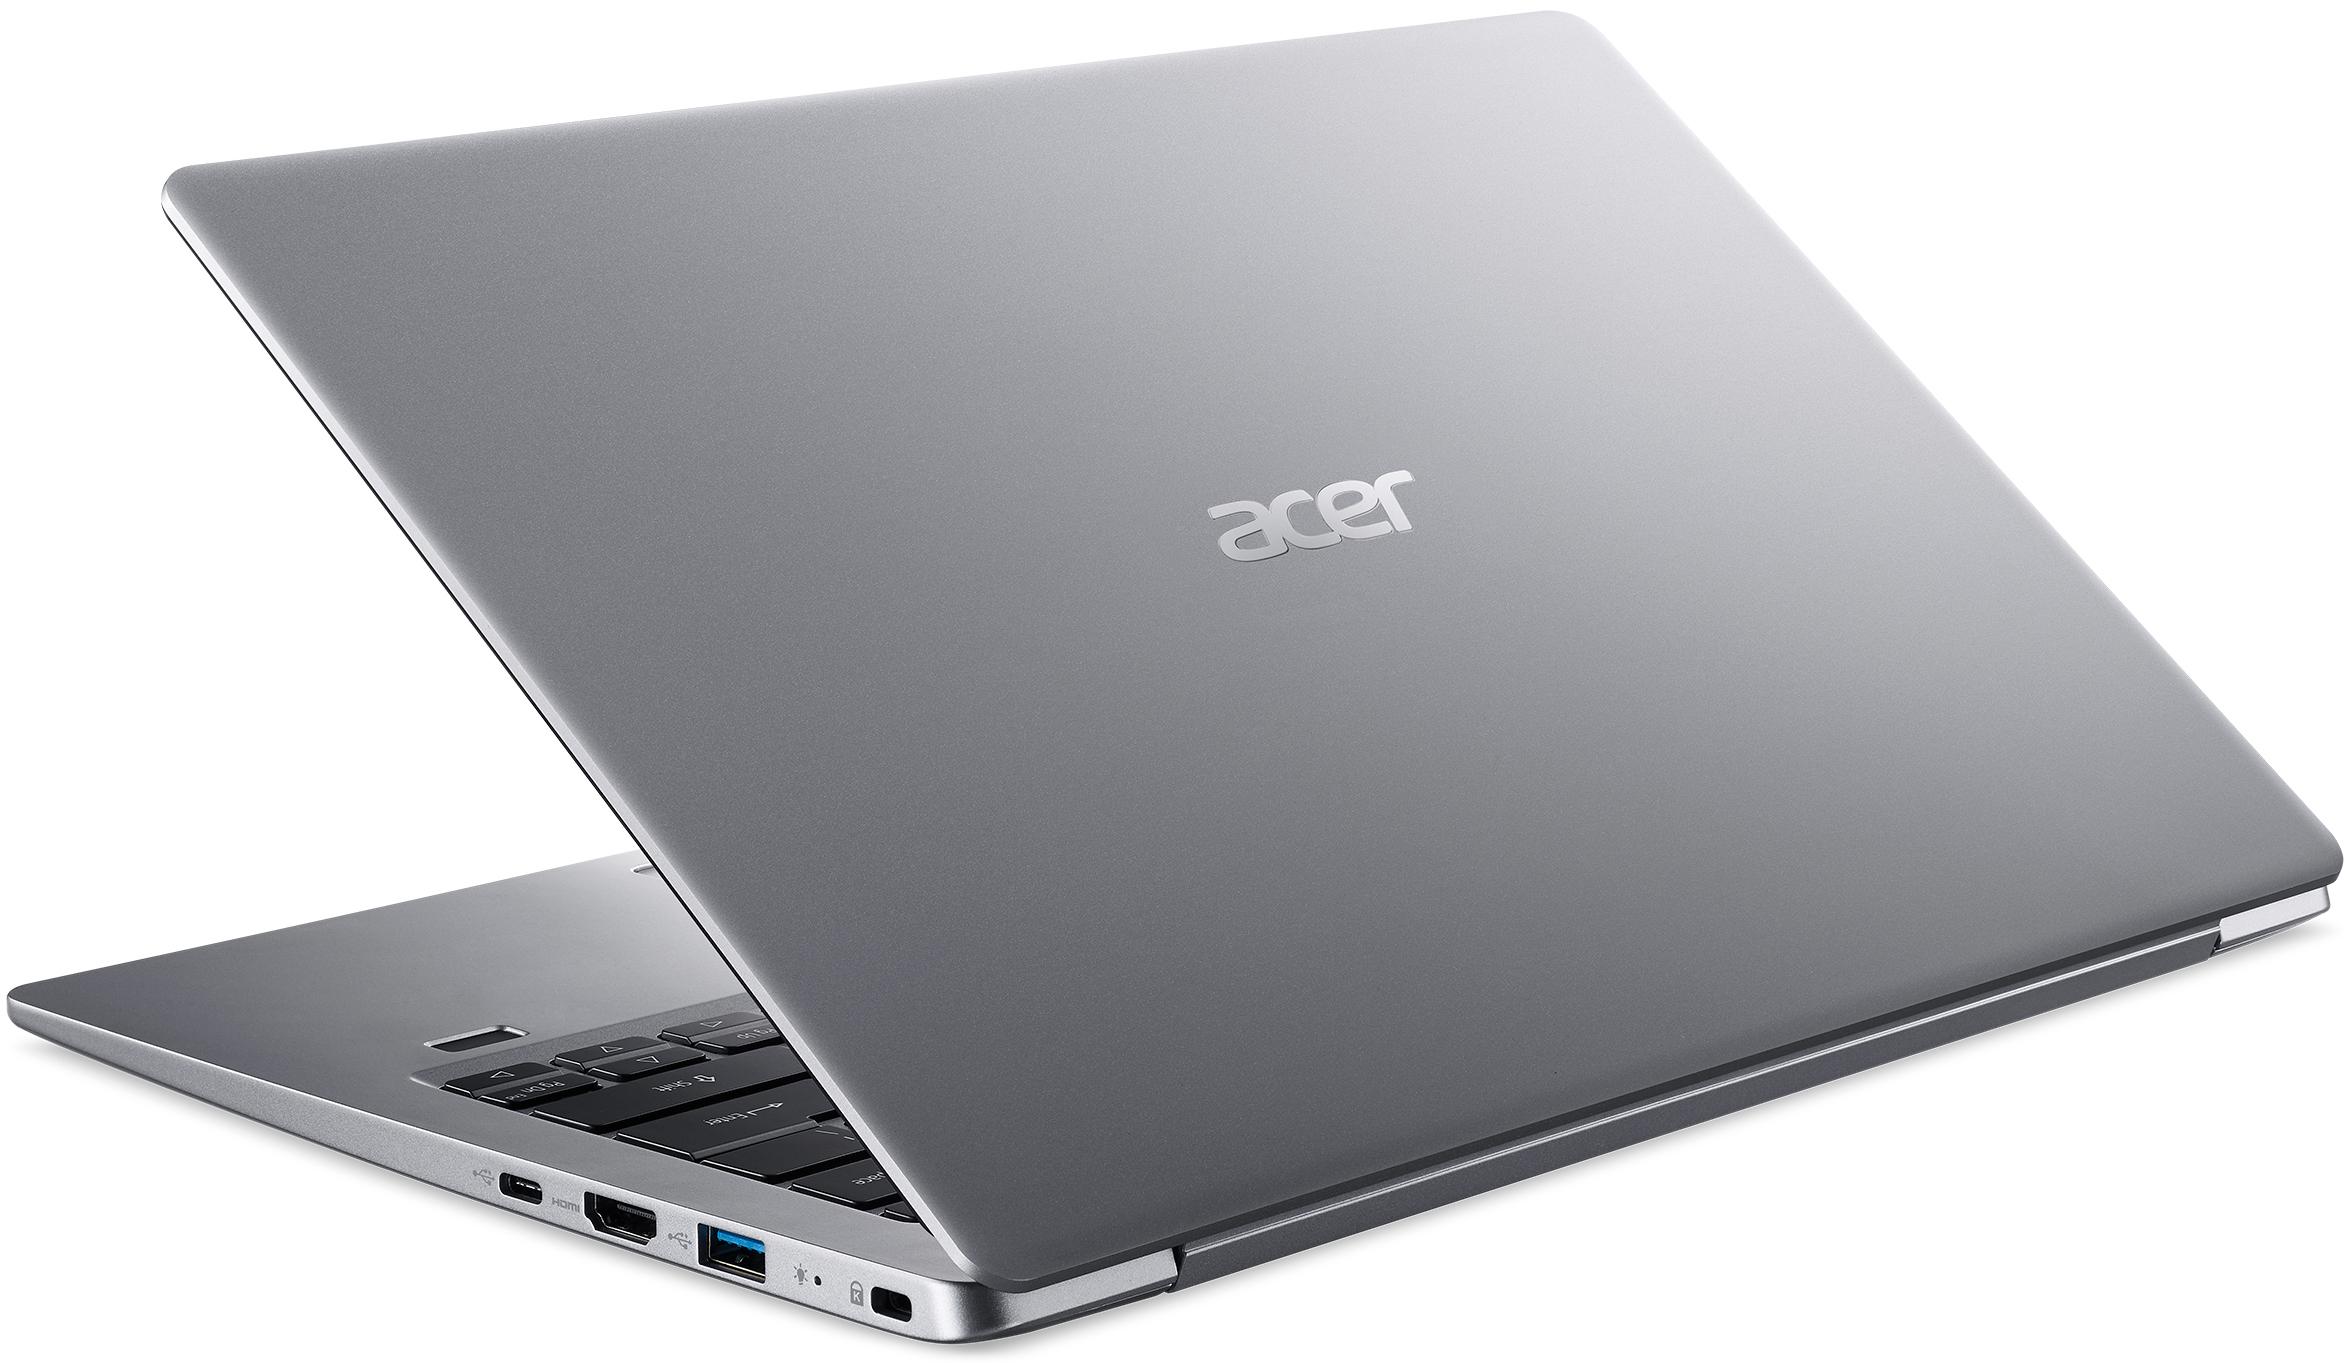 Acer's Swift 3 Laptop Gets 13 3-Inch Display, Slimmer